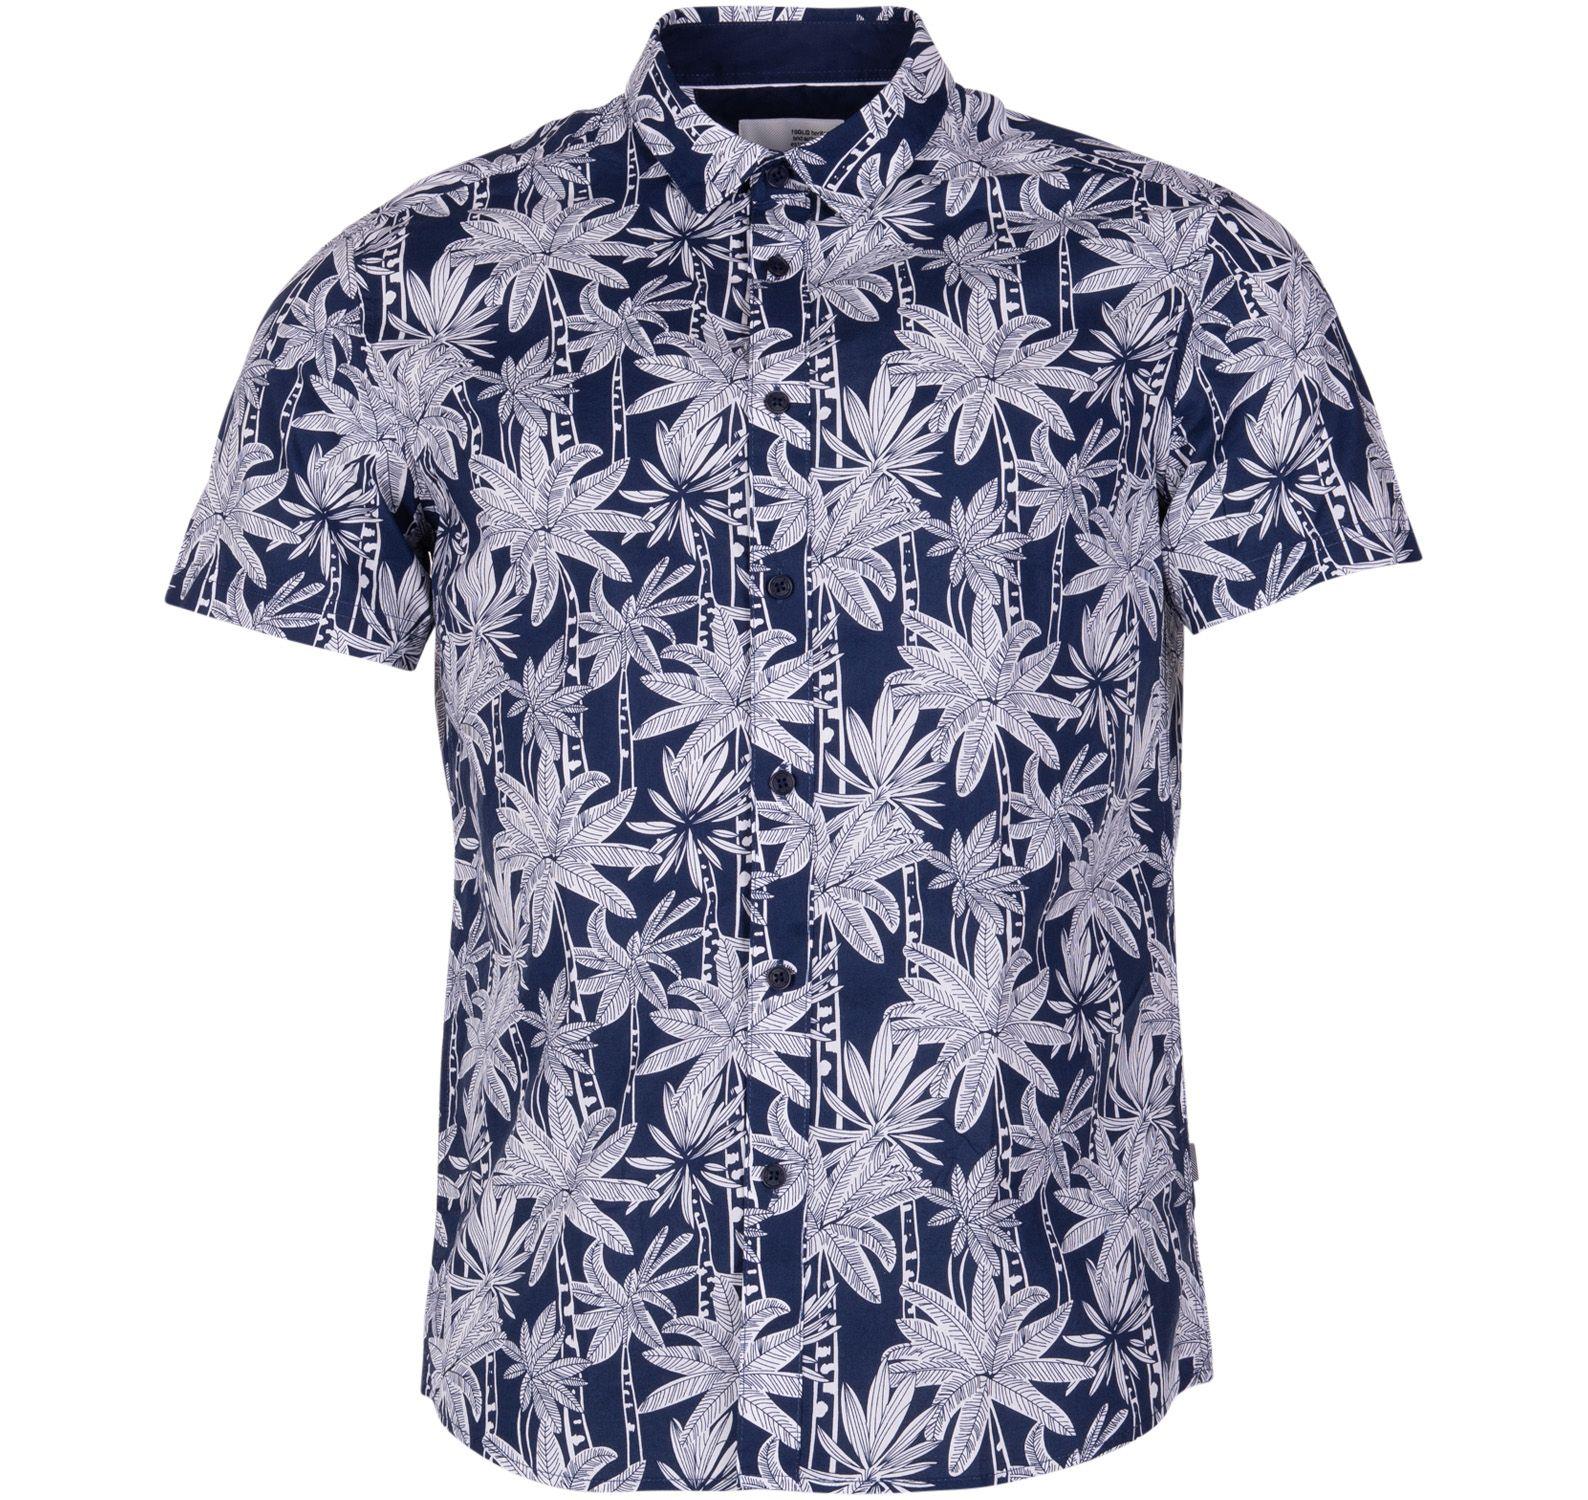 shirt - banks aop ss, insignia b, s, solid